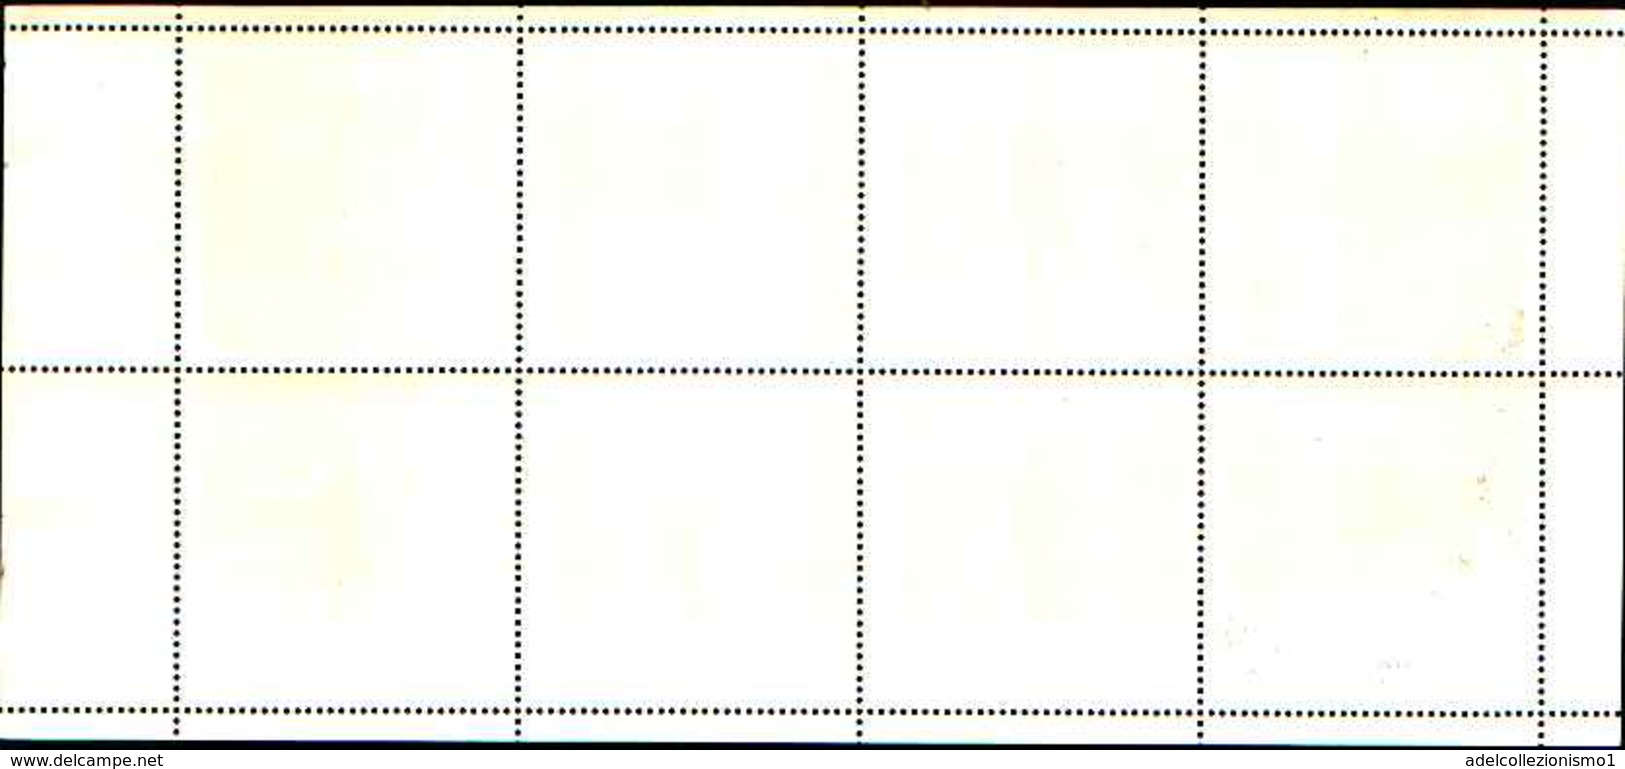 90495)  NAGALAND- UNIFORMI MILITARI NEI SECOLI- SOLDATI -MNH**  DENTELLATA - Stamps